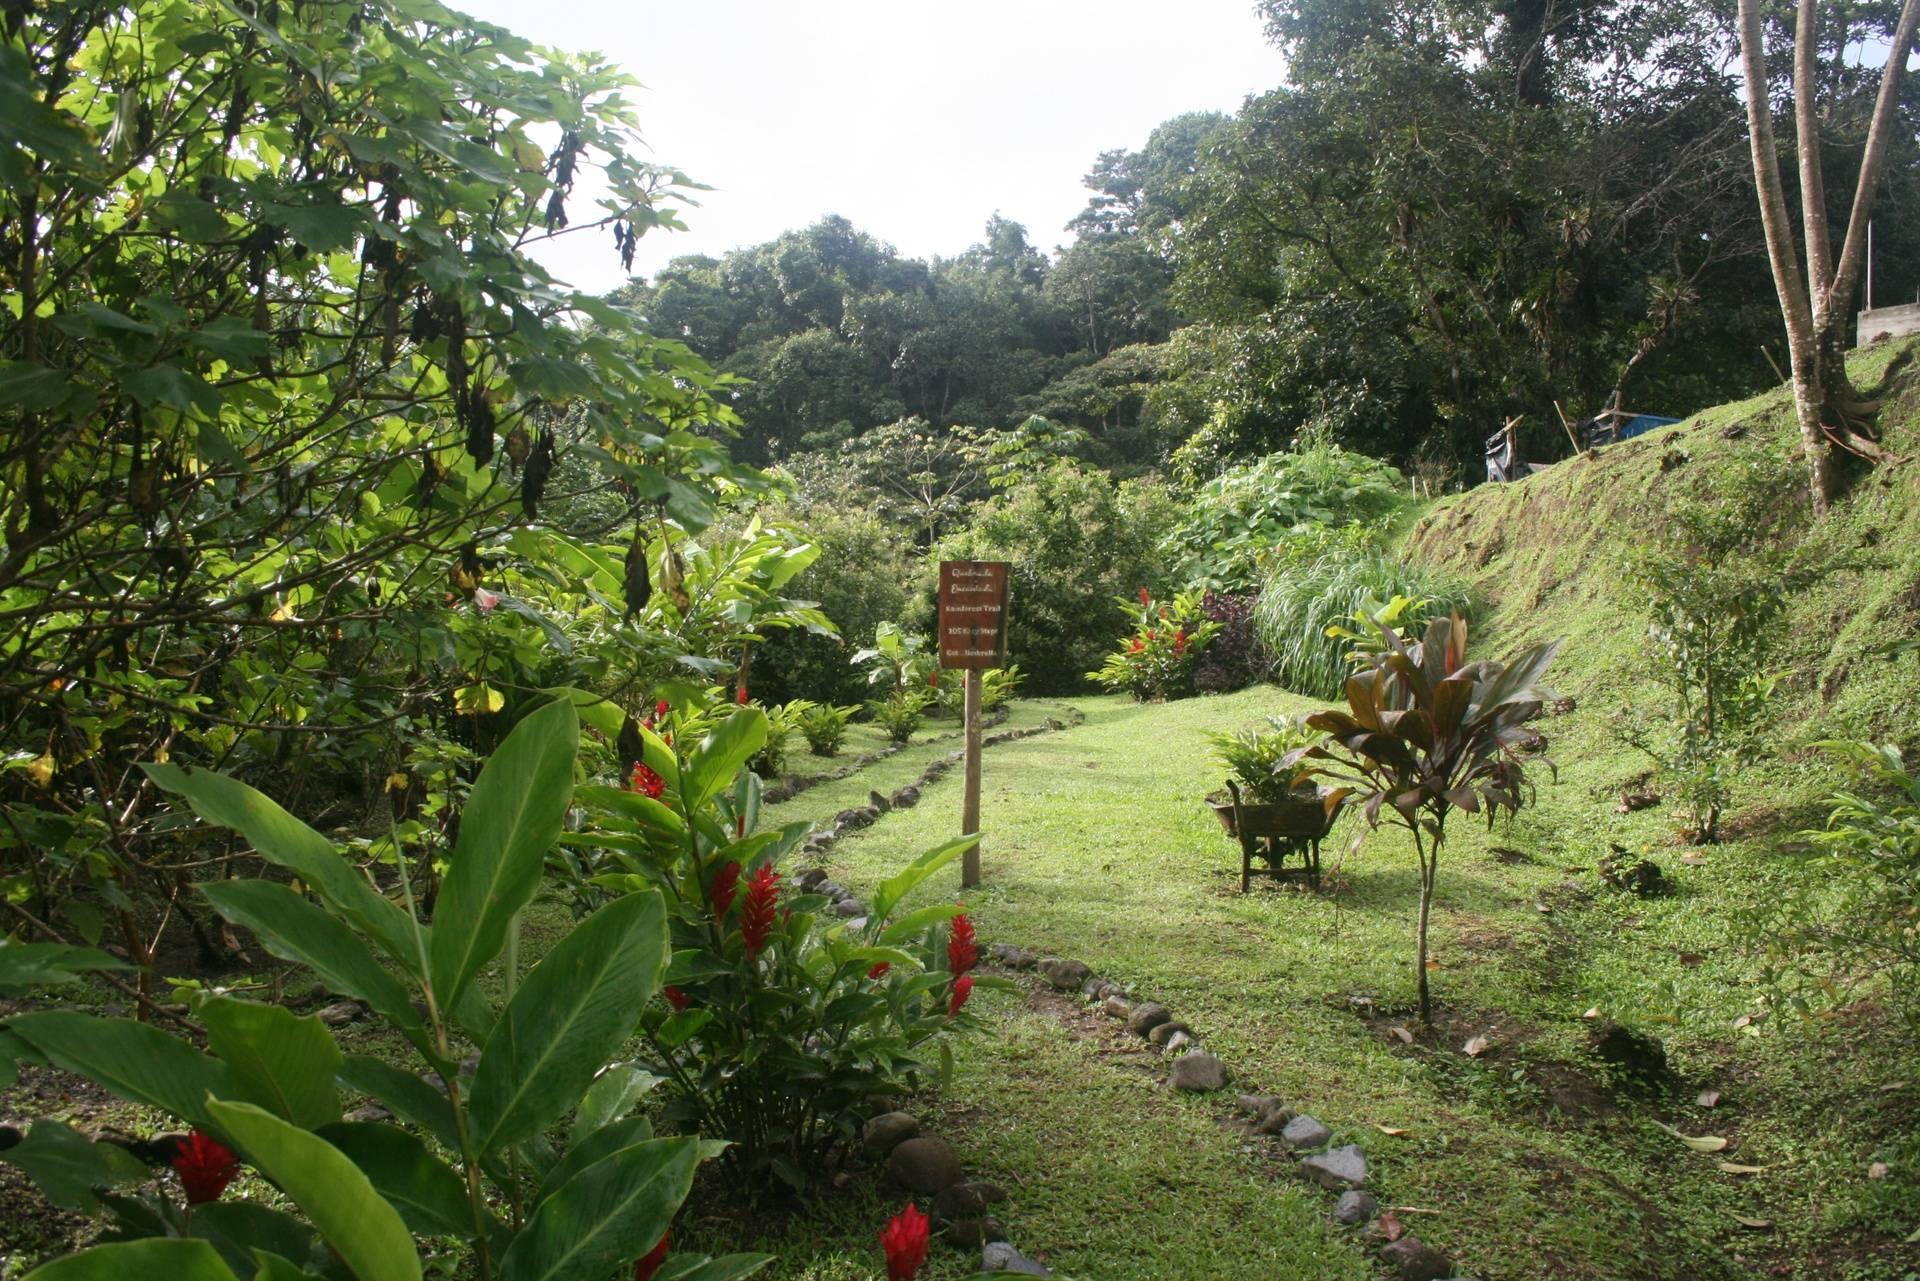 Rainforest Hiking Trail